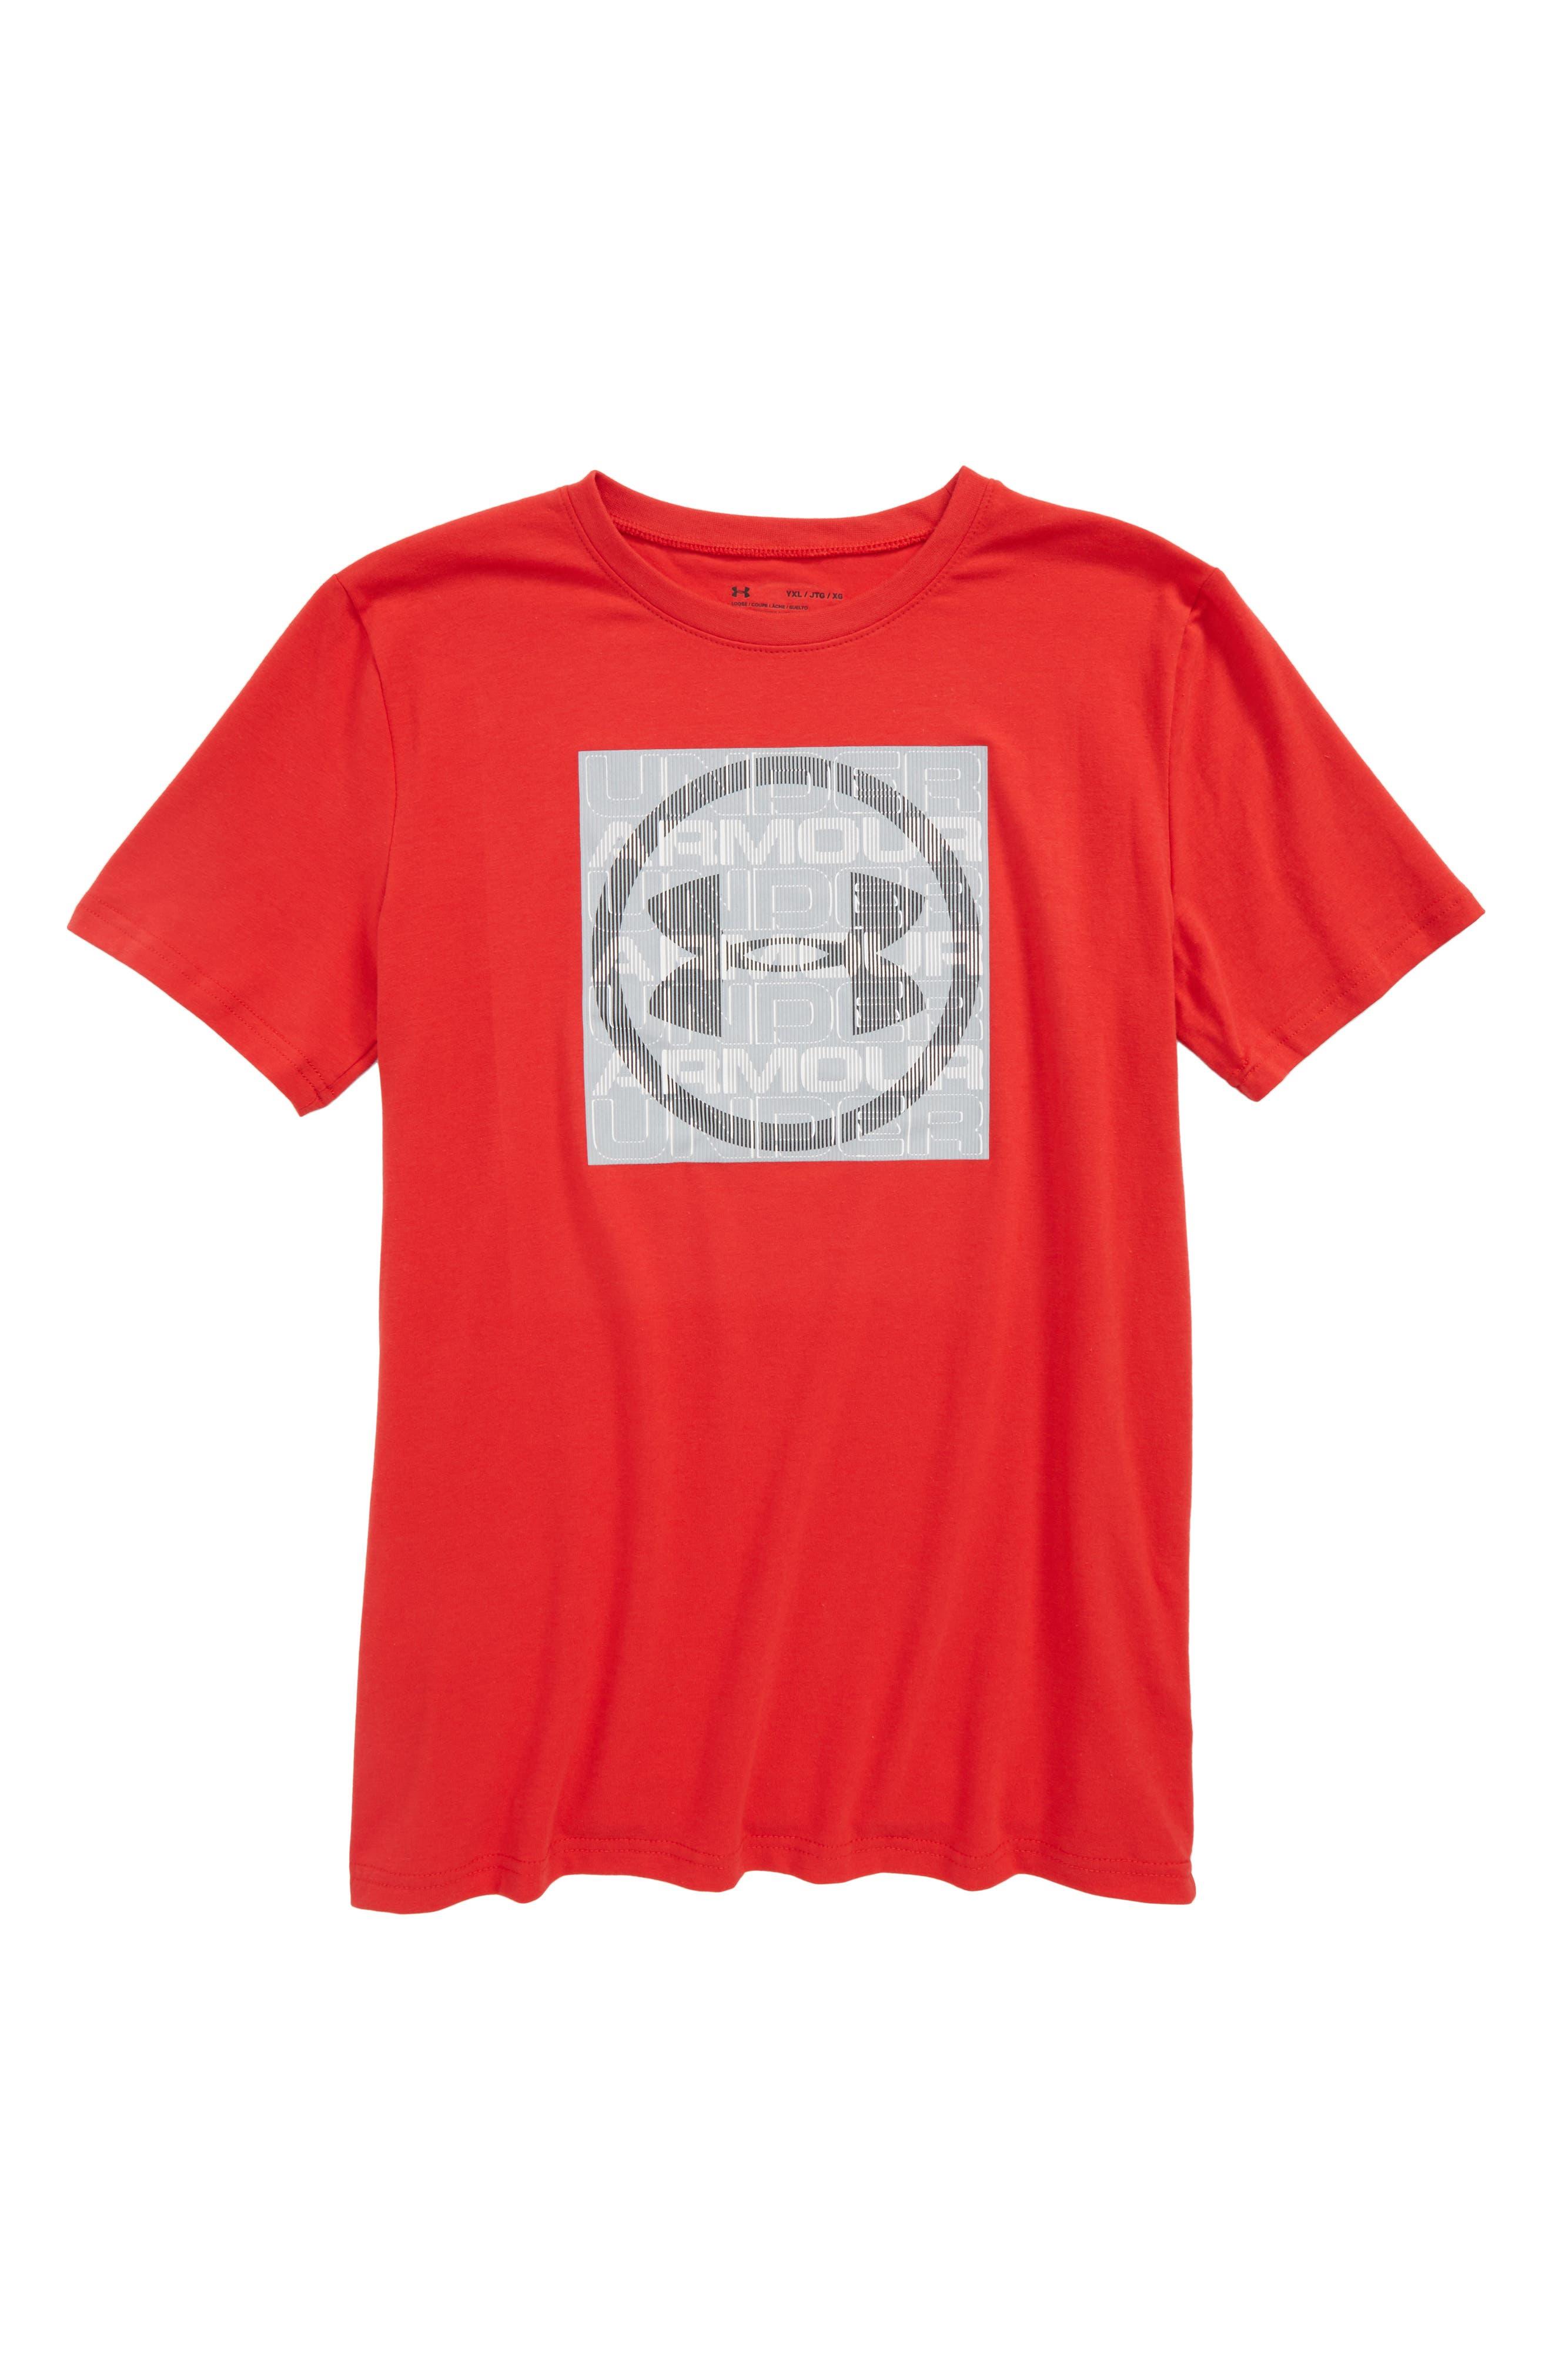 Visualogo T-Shirt,                         Main,                         color, Red/ Black